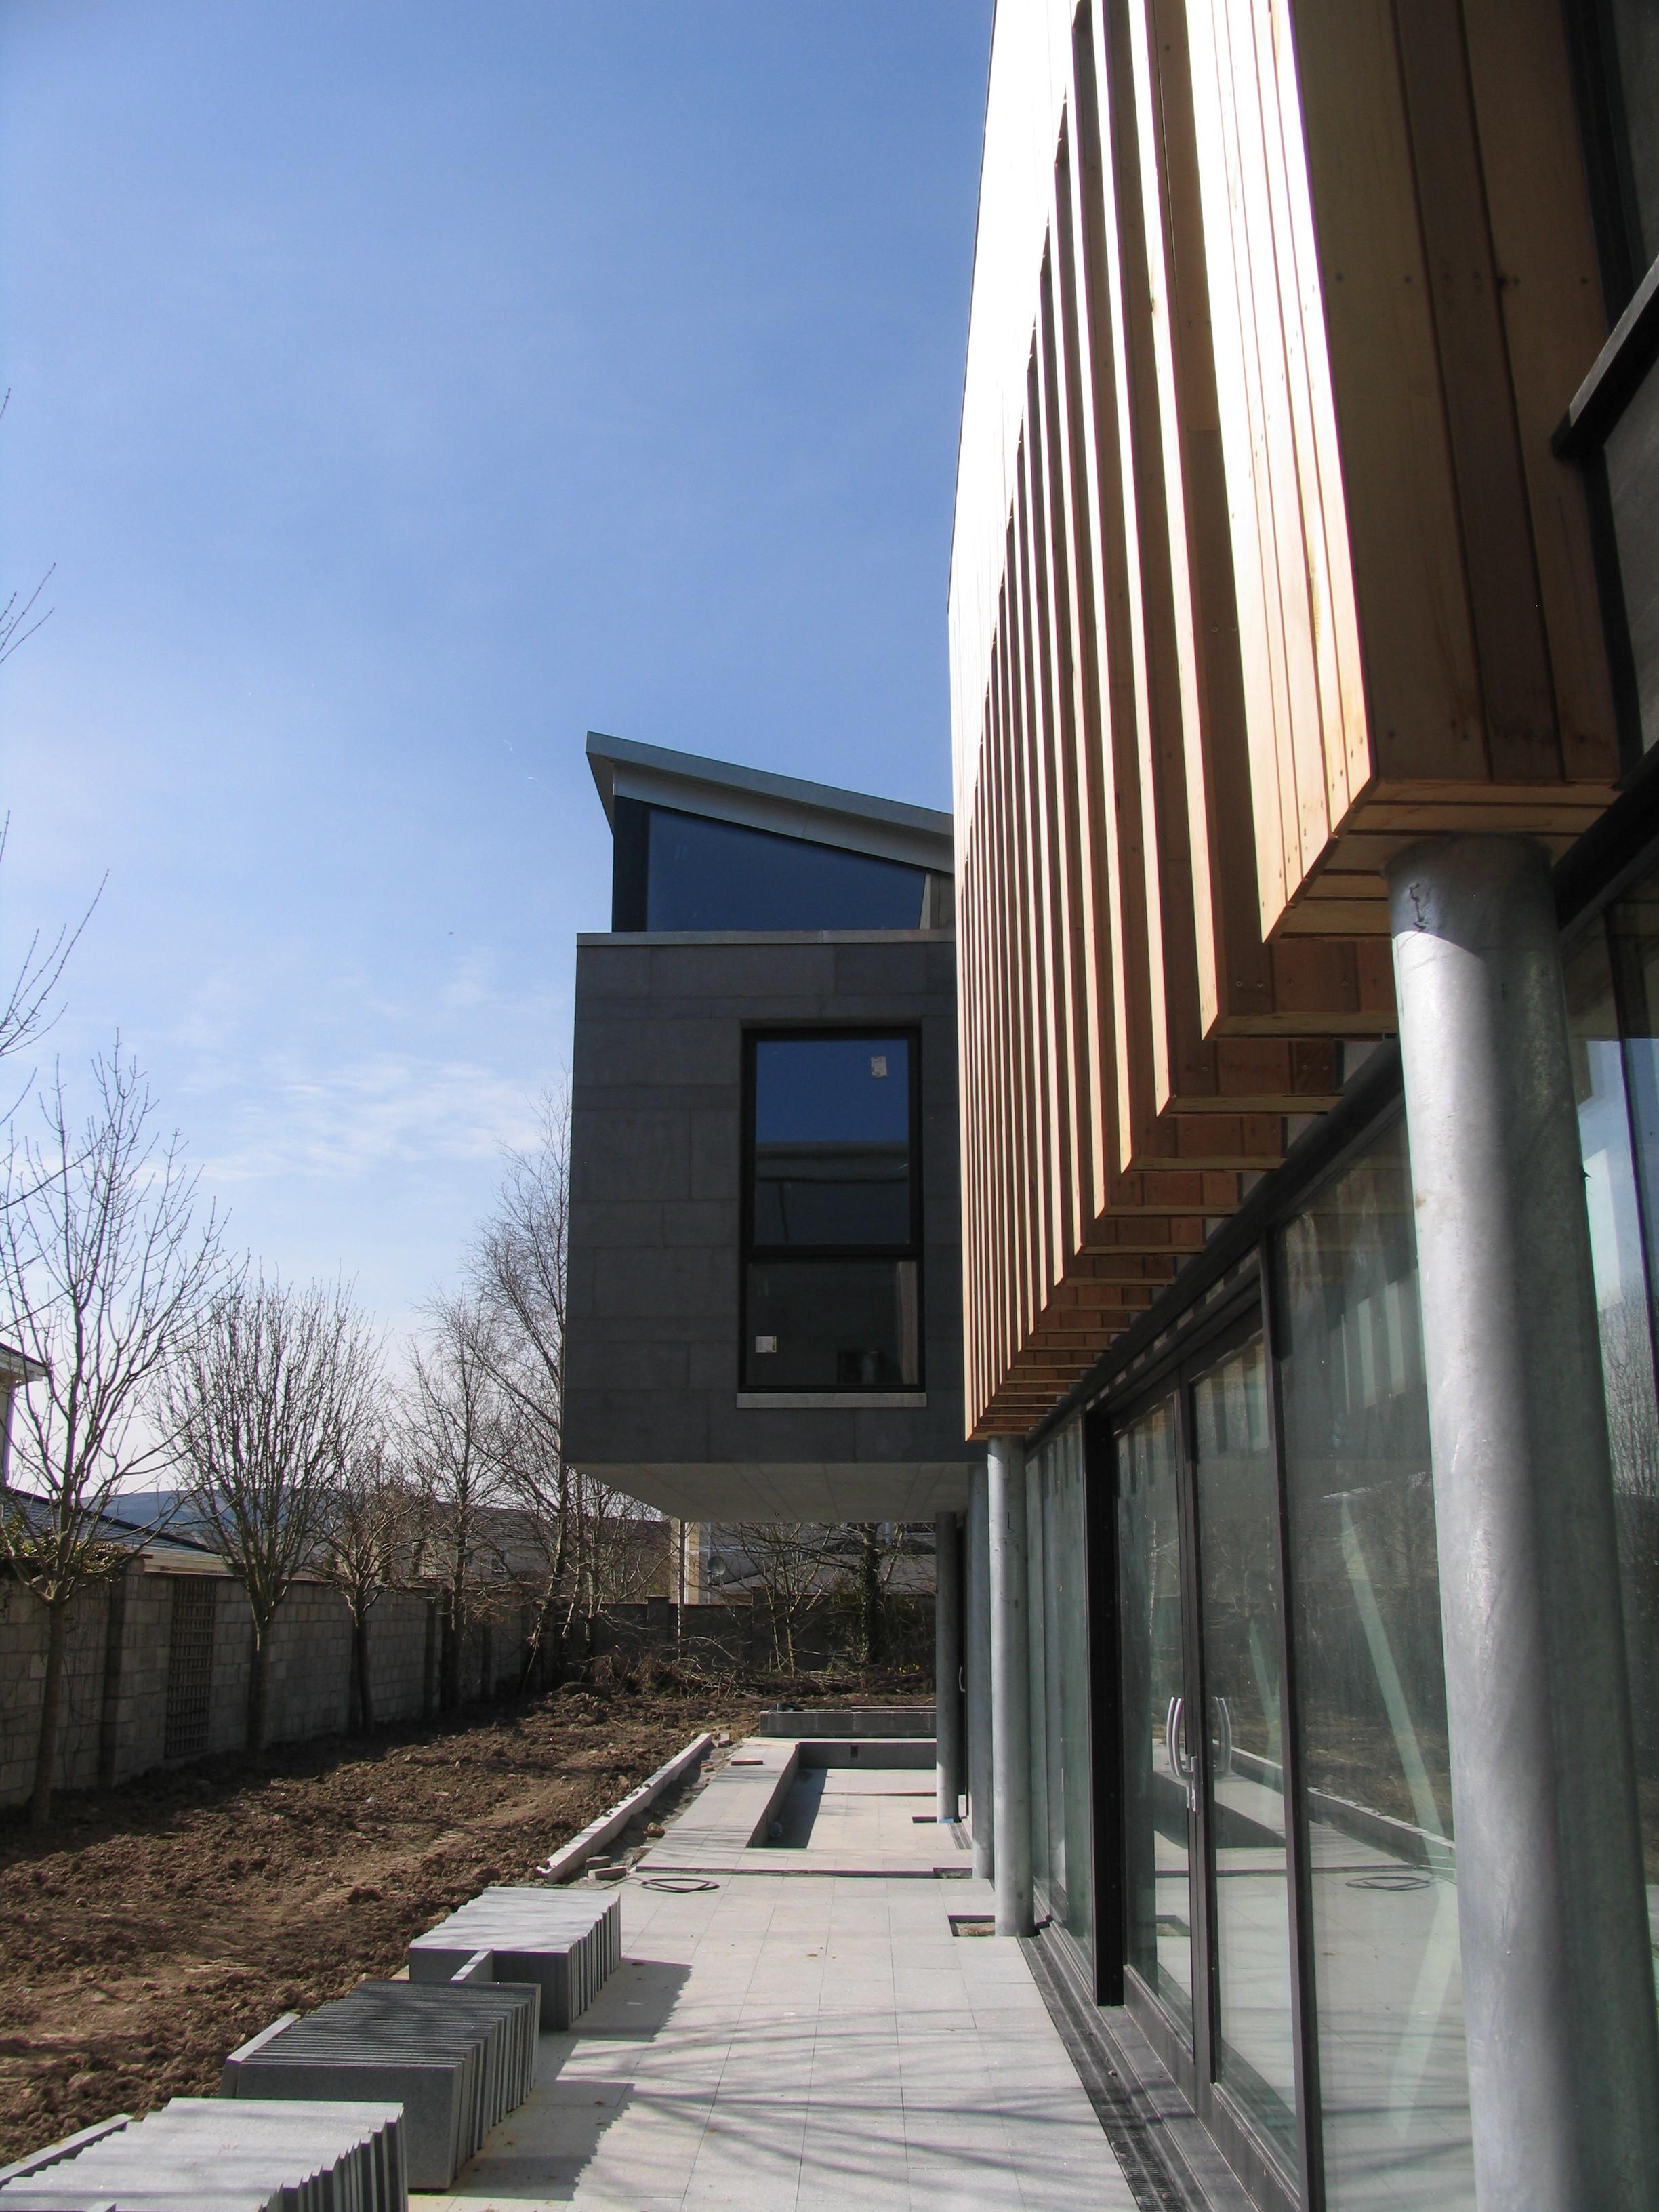 south facing patio